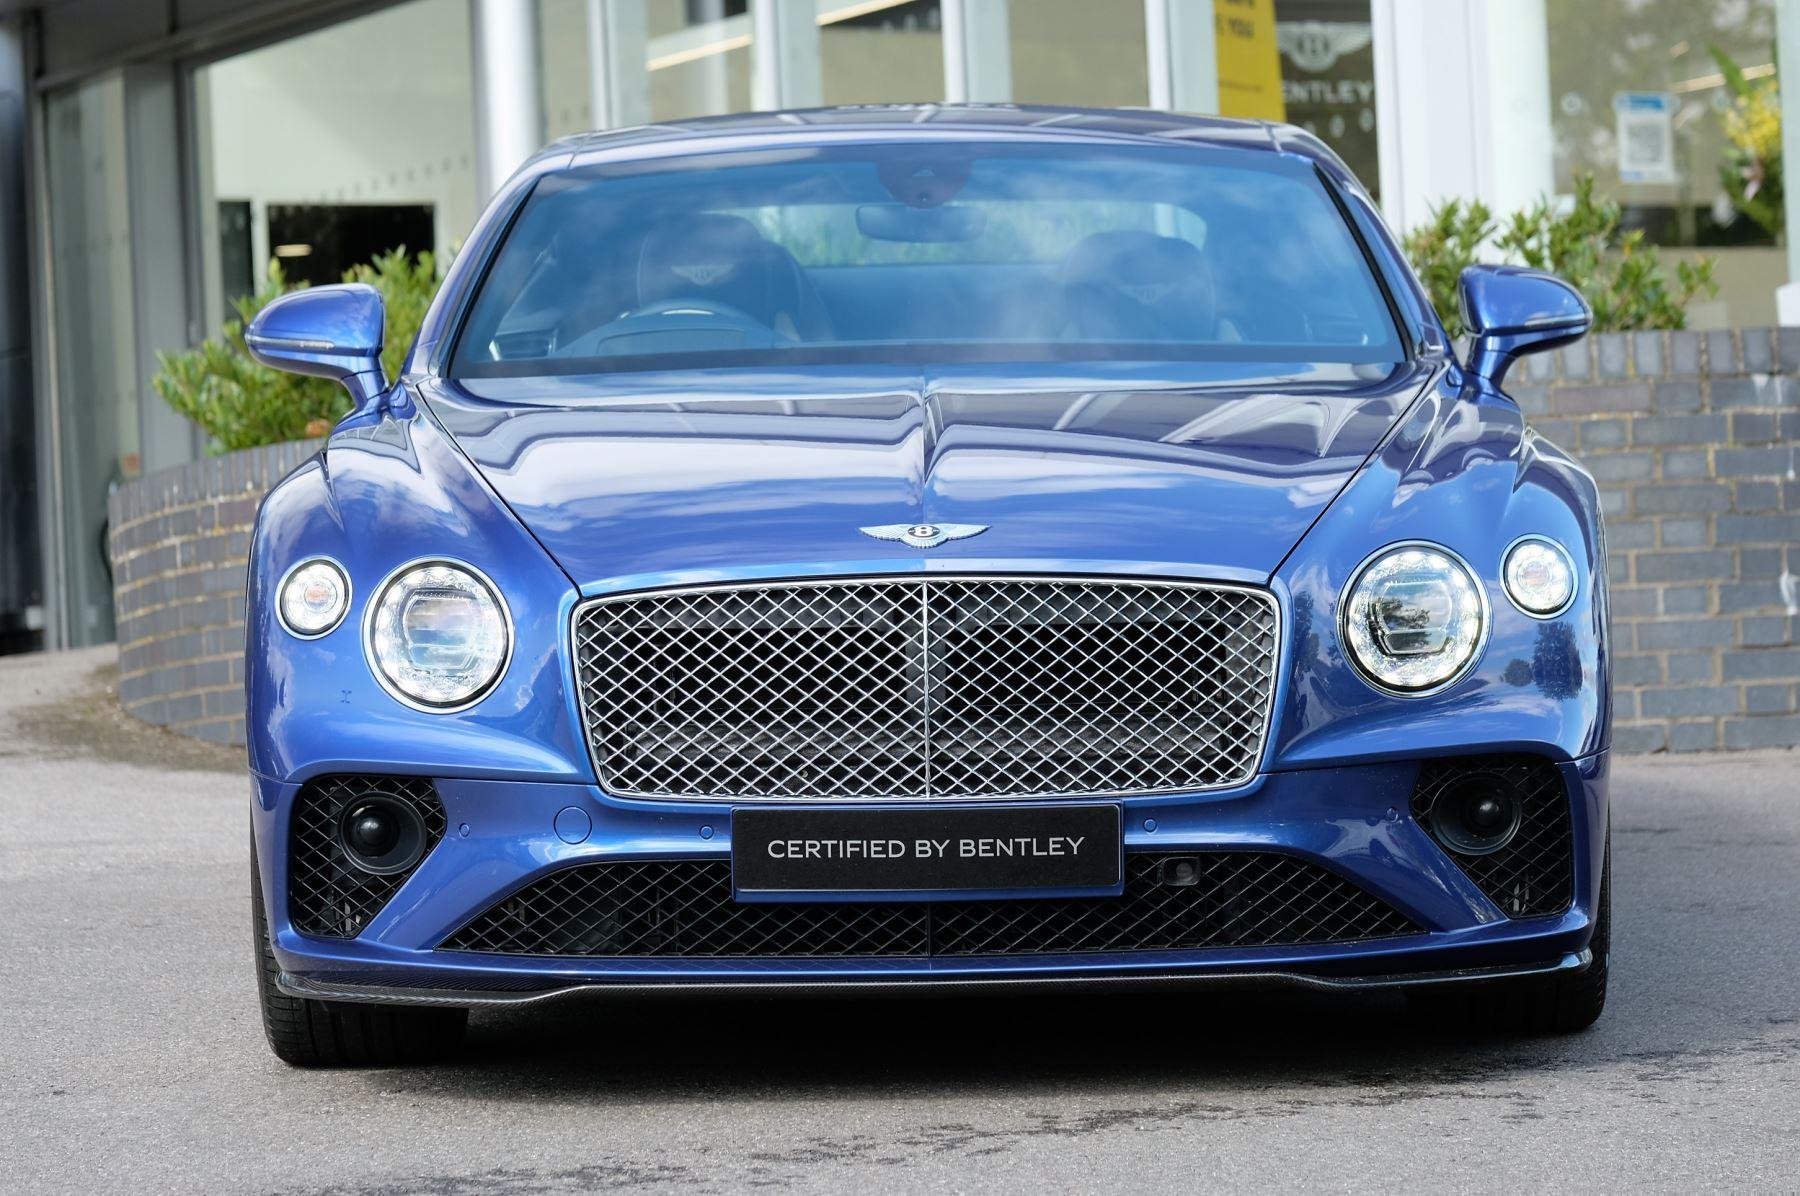 Bentley Continental GT 4.0 V8 2dr Mulliner Driving Specification image 2